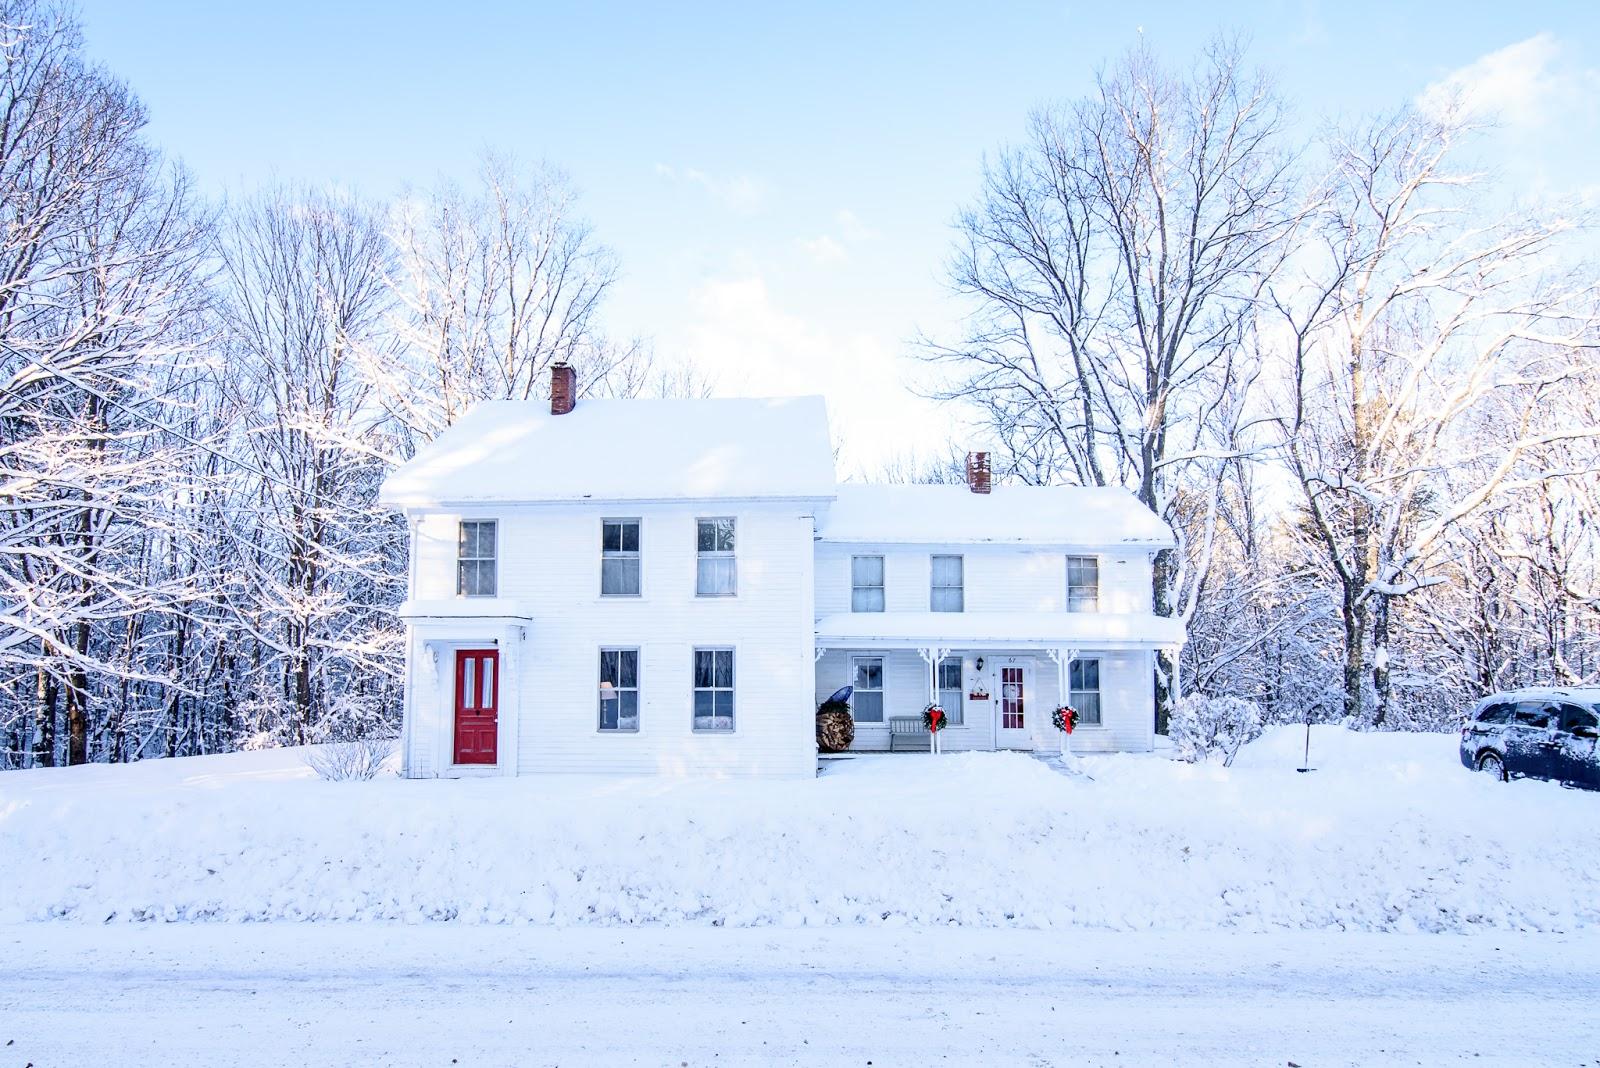 The house I grew up in ©Diana Sherblom